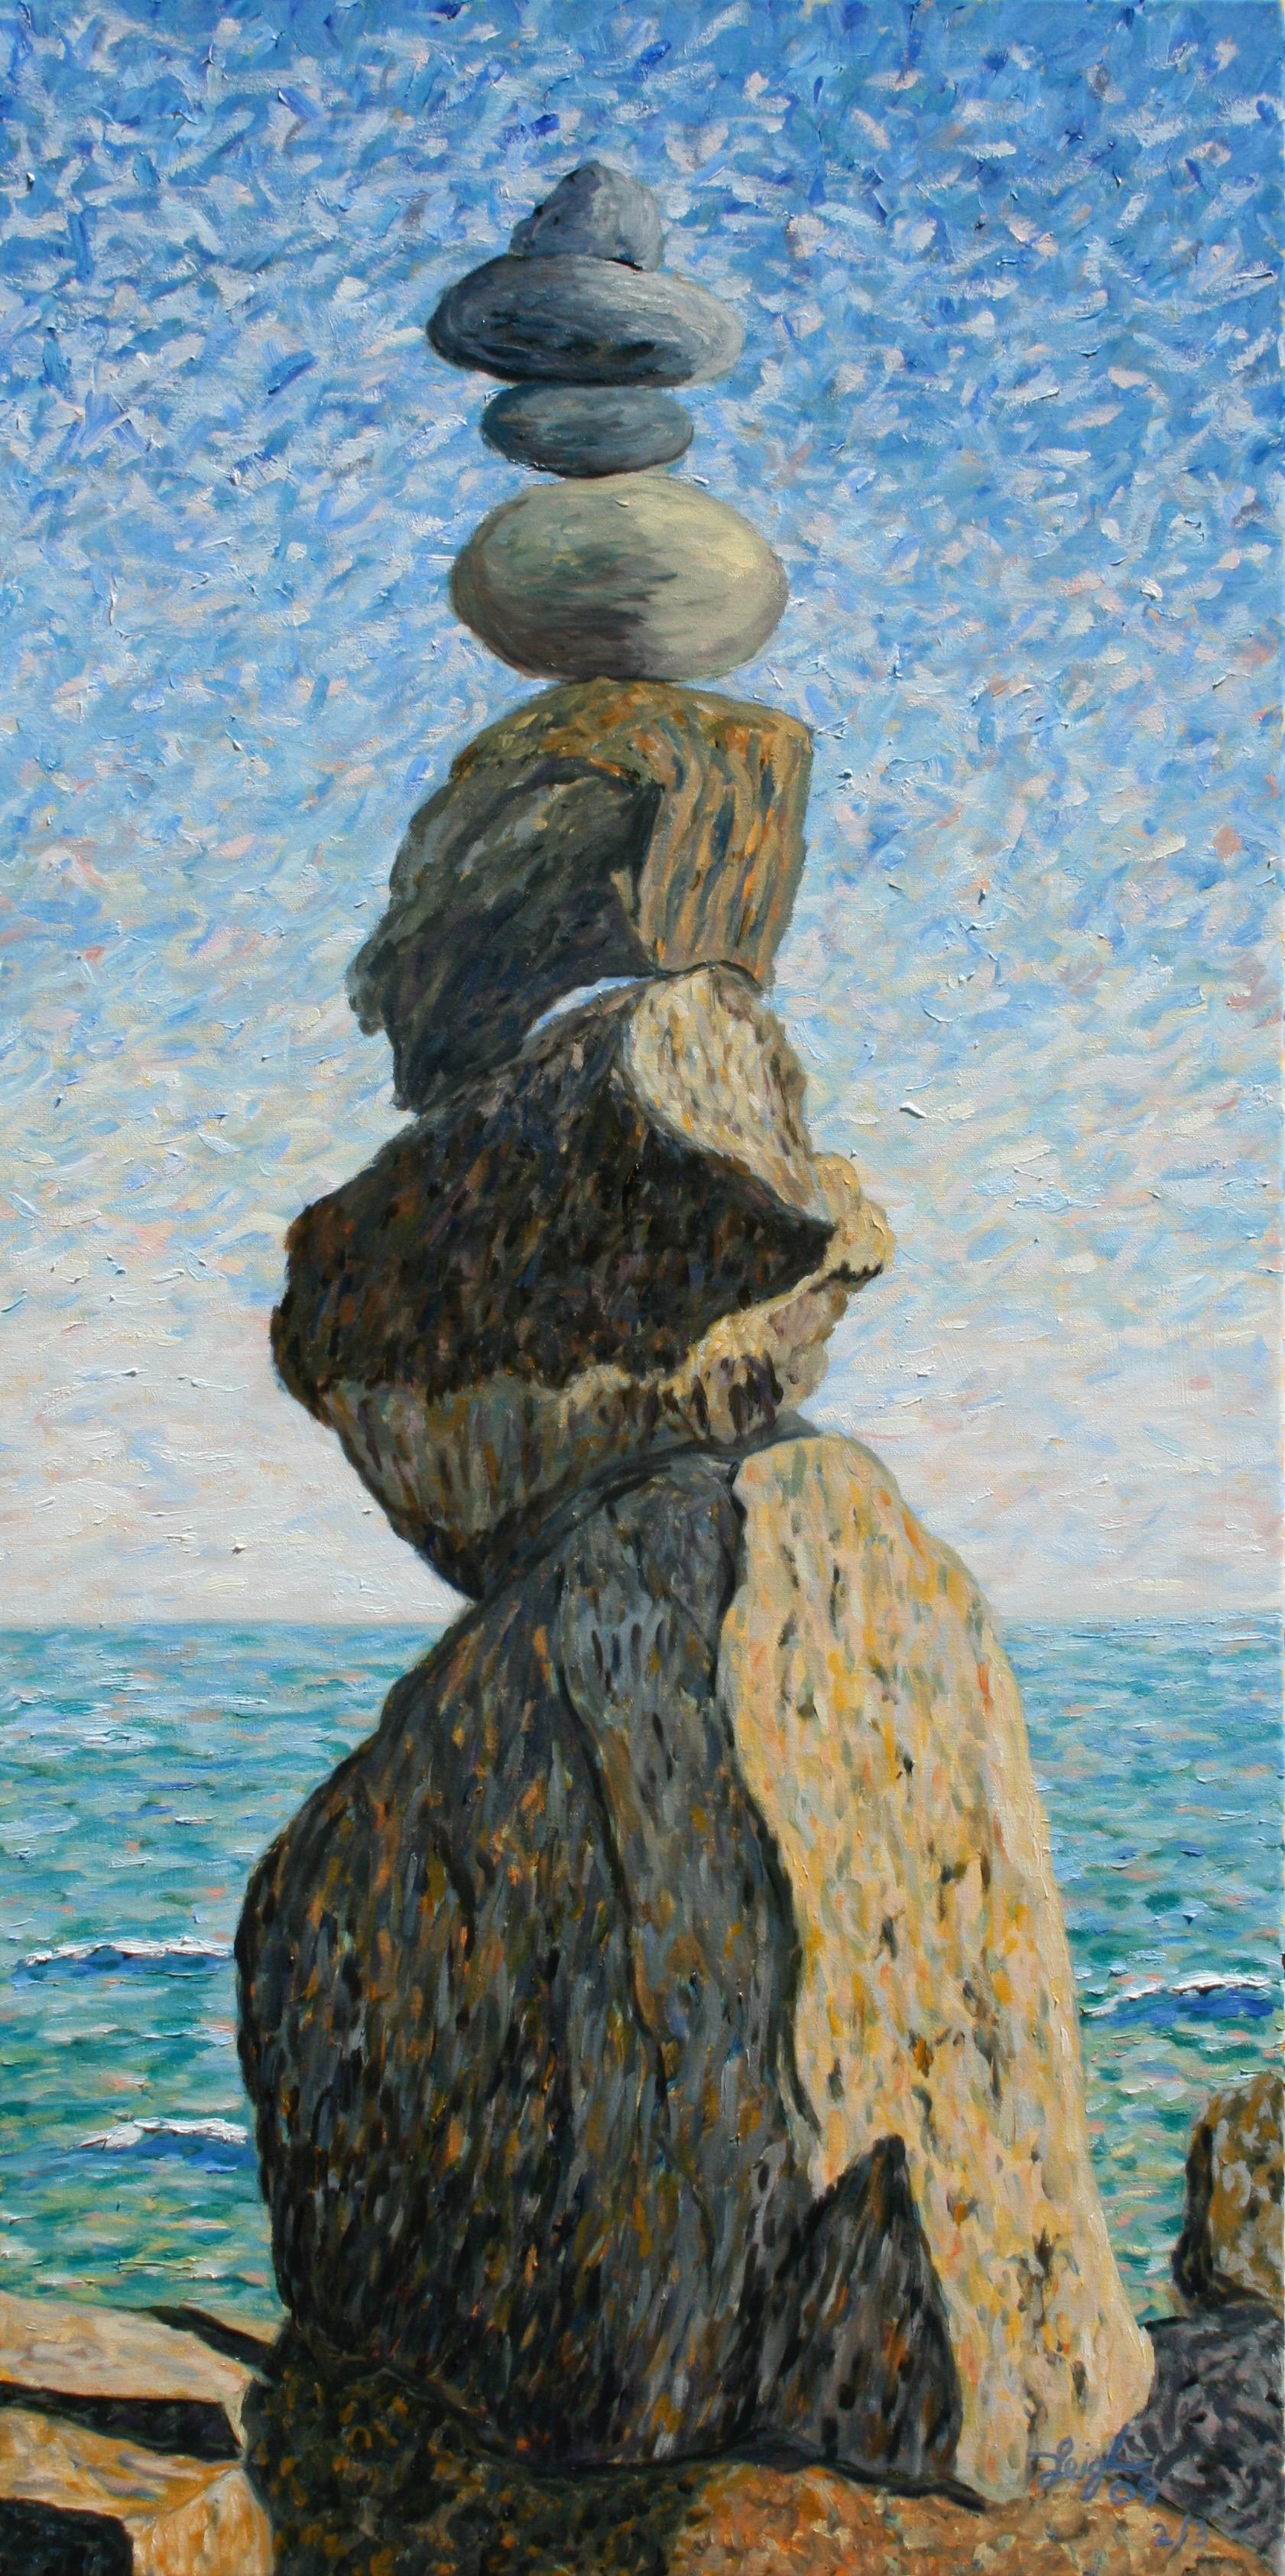 Rock Sculpture #2